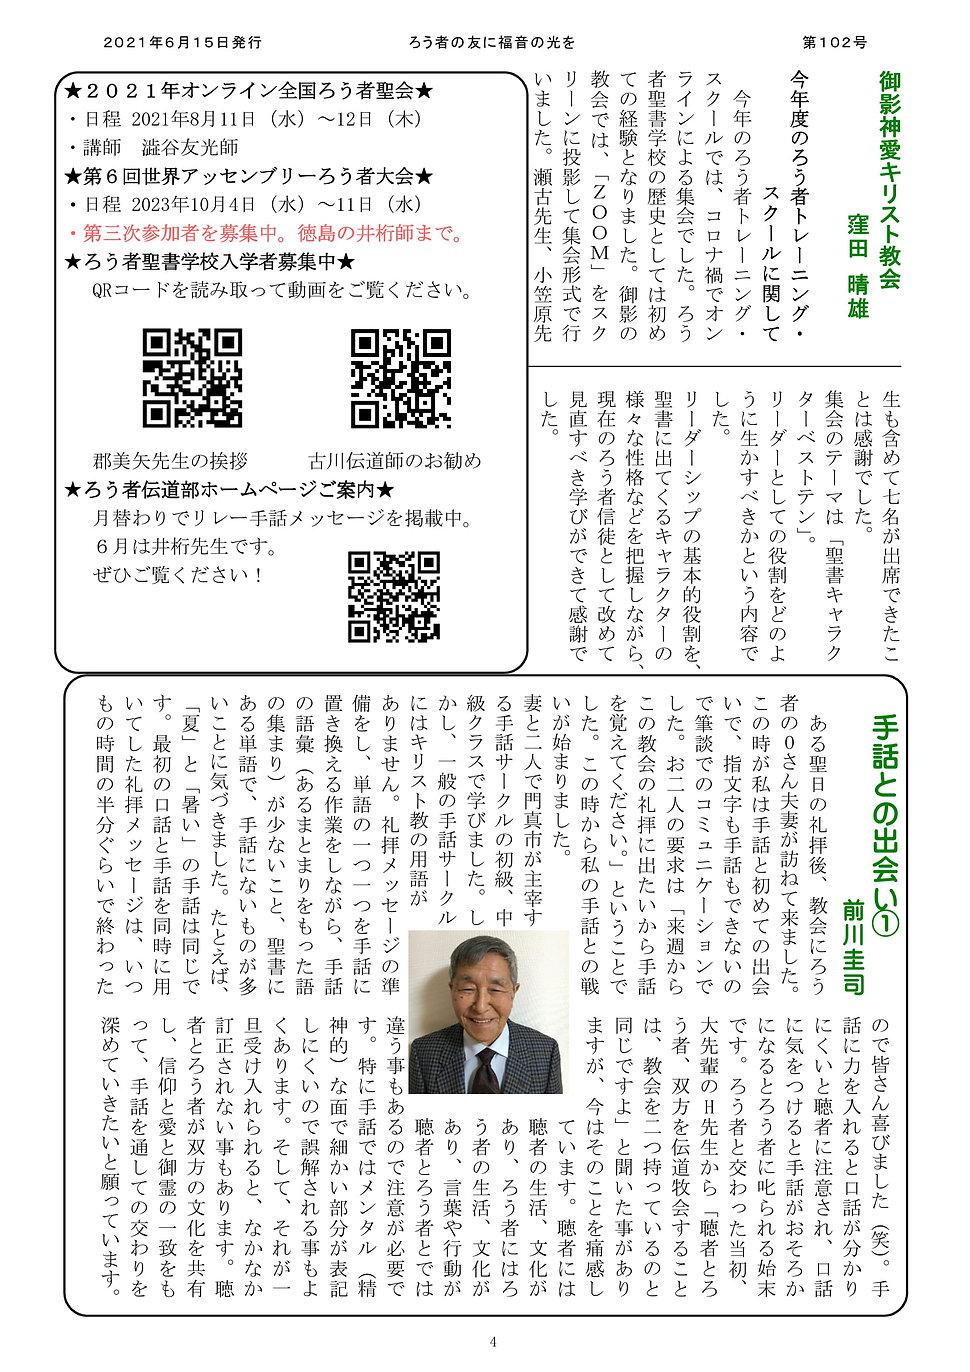 Taro-エパタ102 2021 6月15日-4.jpg